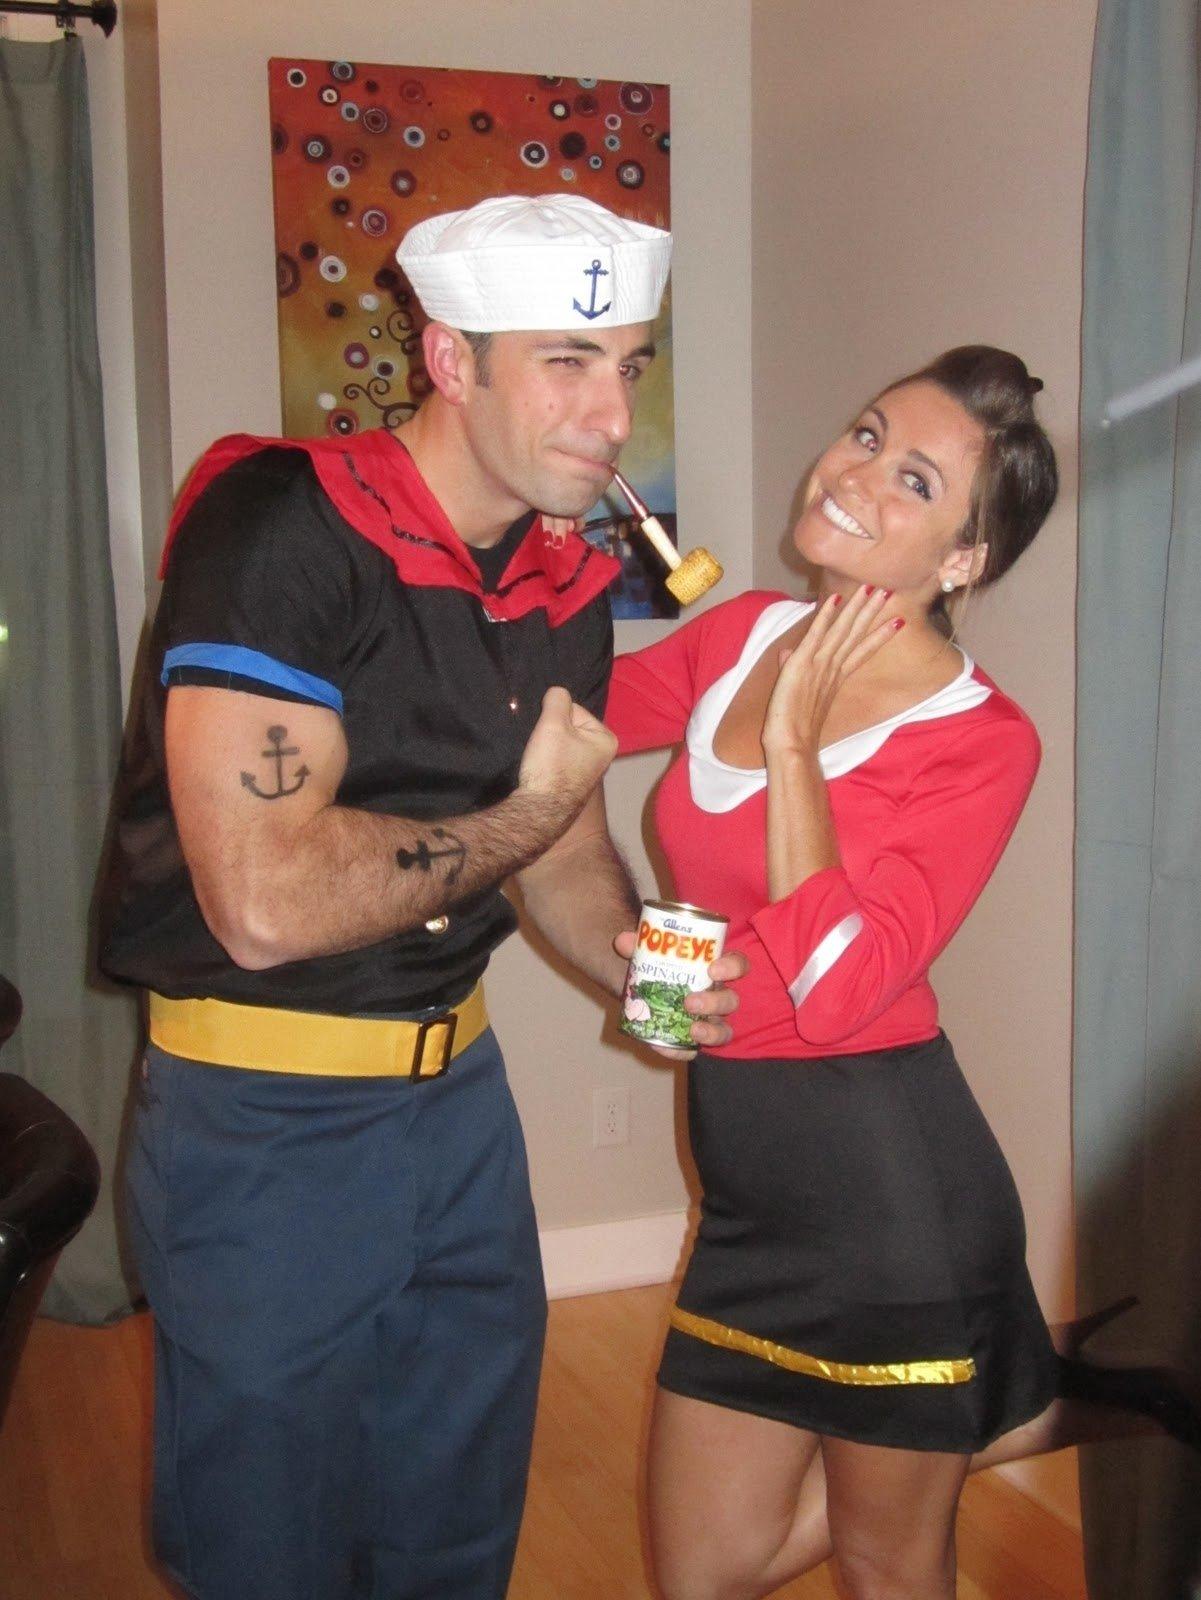 10 Nice Best Couple Halloween Costume Ideas 25 genius diy couples costumes brit co 3 2020